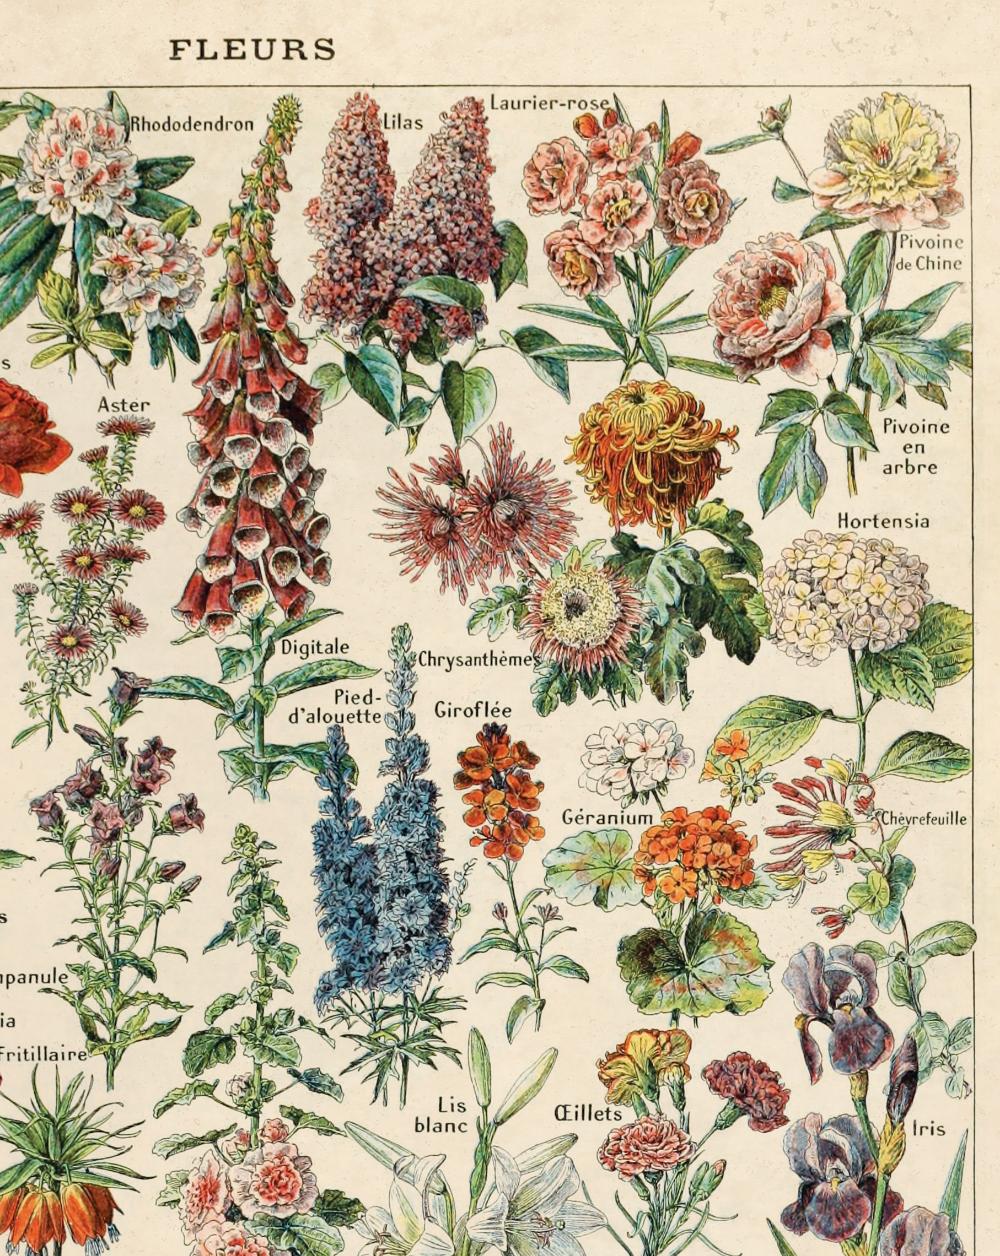 Vintage French Garden Flower Canvas Hanging Chart Fleurs Le Petit Larousse By Millot Educational In 2020 Botanical Drawings Vintage Flower Prints Flower Aesthetic